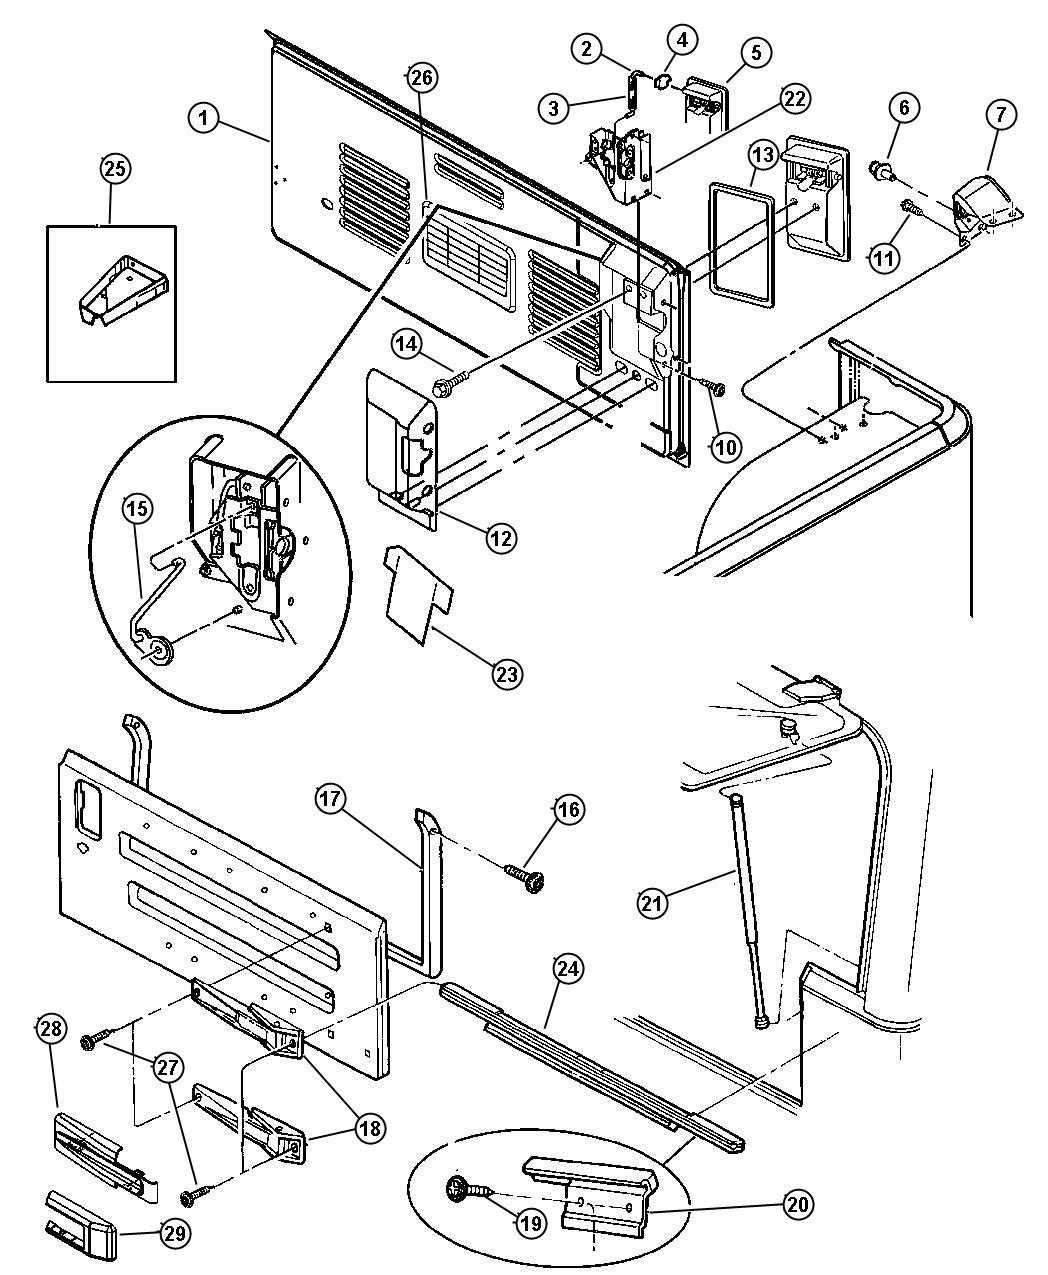 2006 wrangler tj wiring diagram honeywell r8285d jeep commander oem parts auto